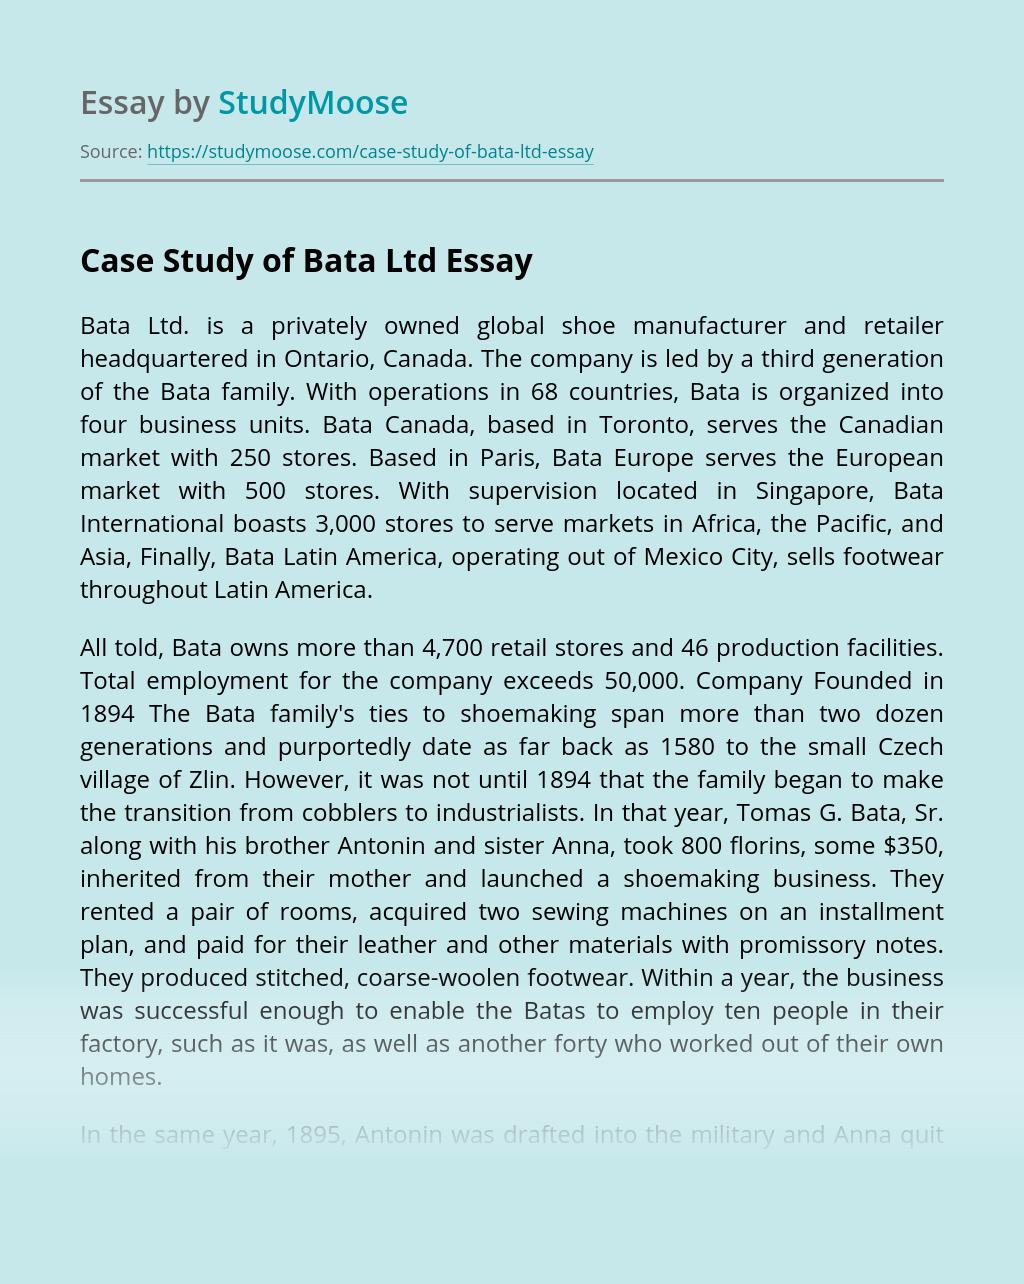 Case Study of Bata Ltd